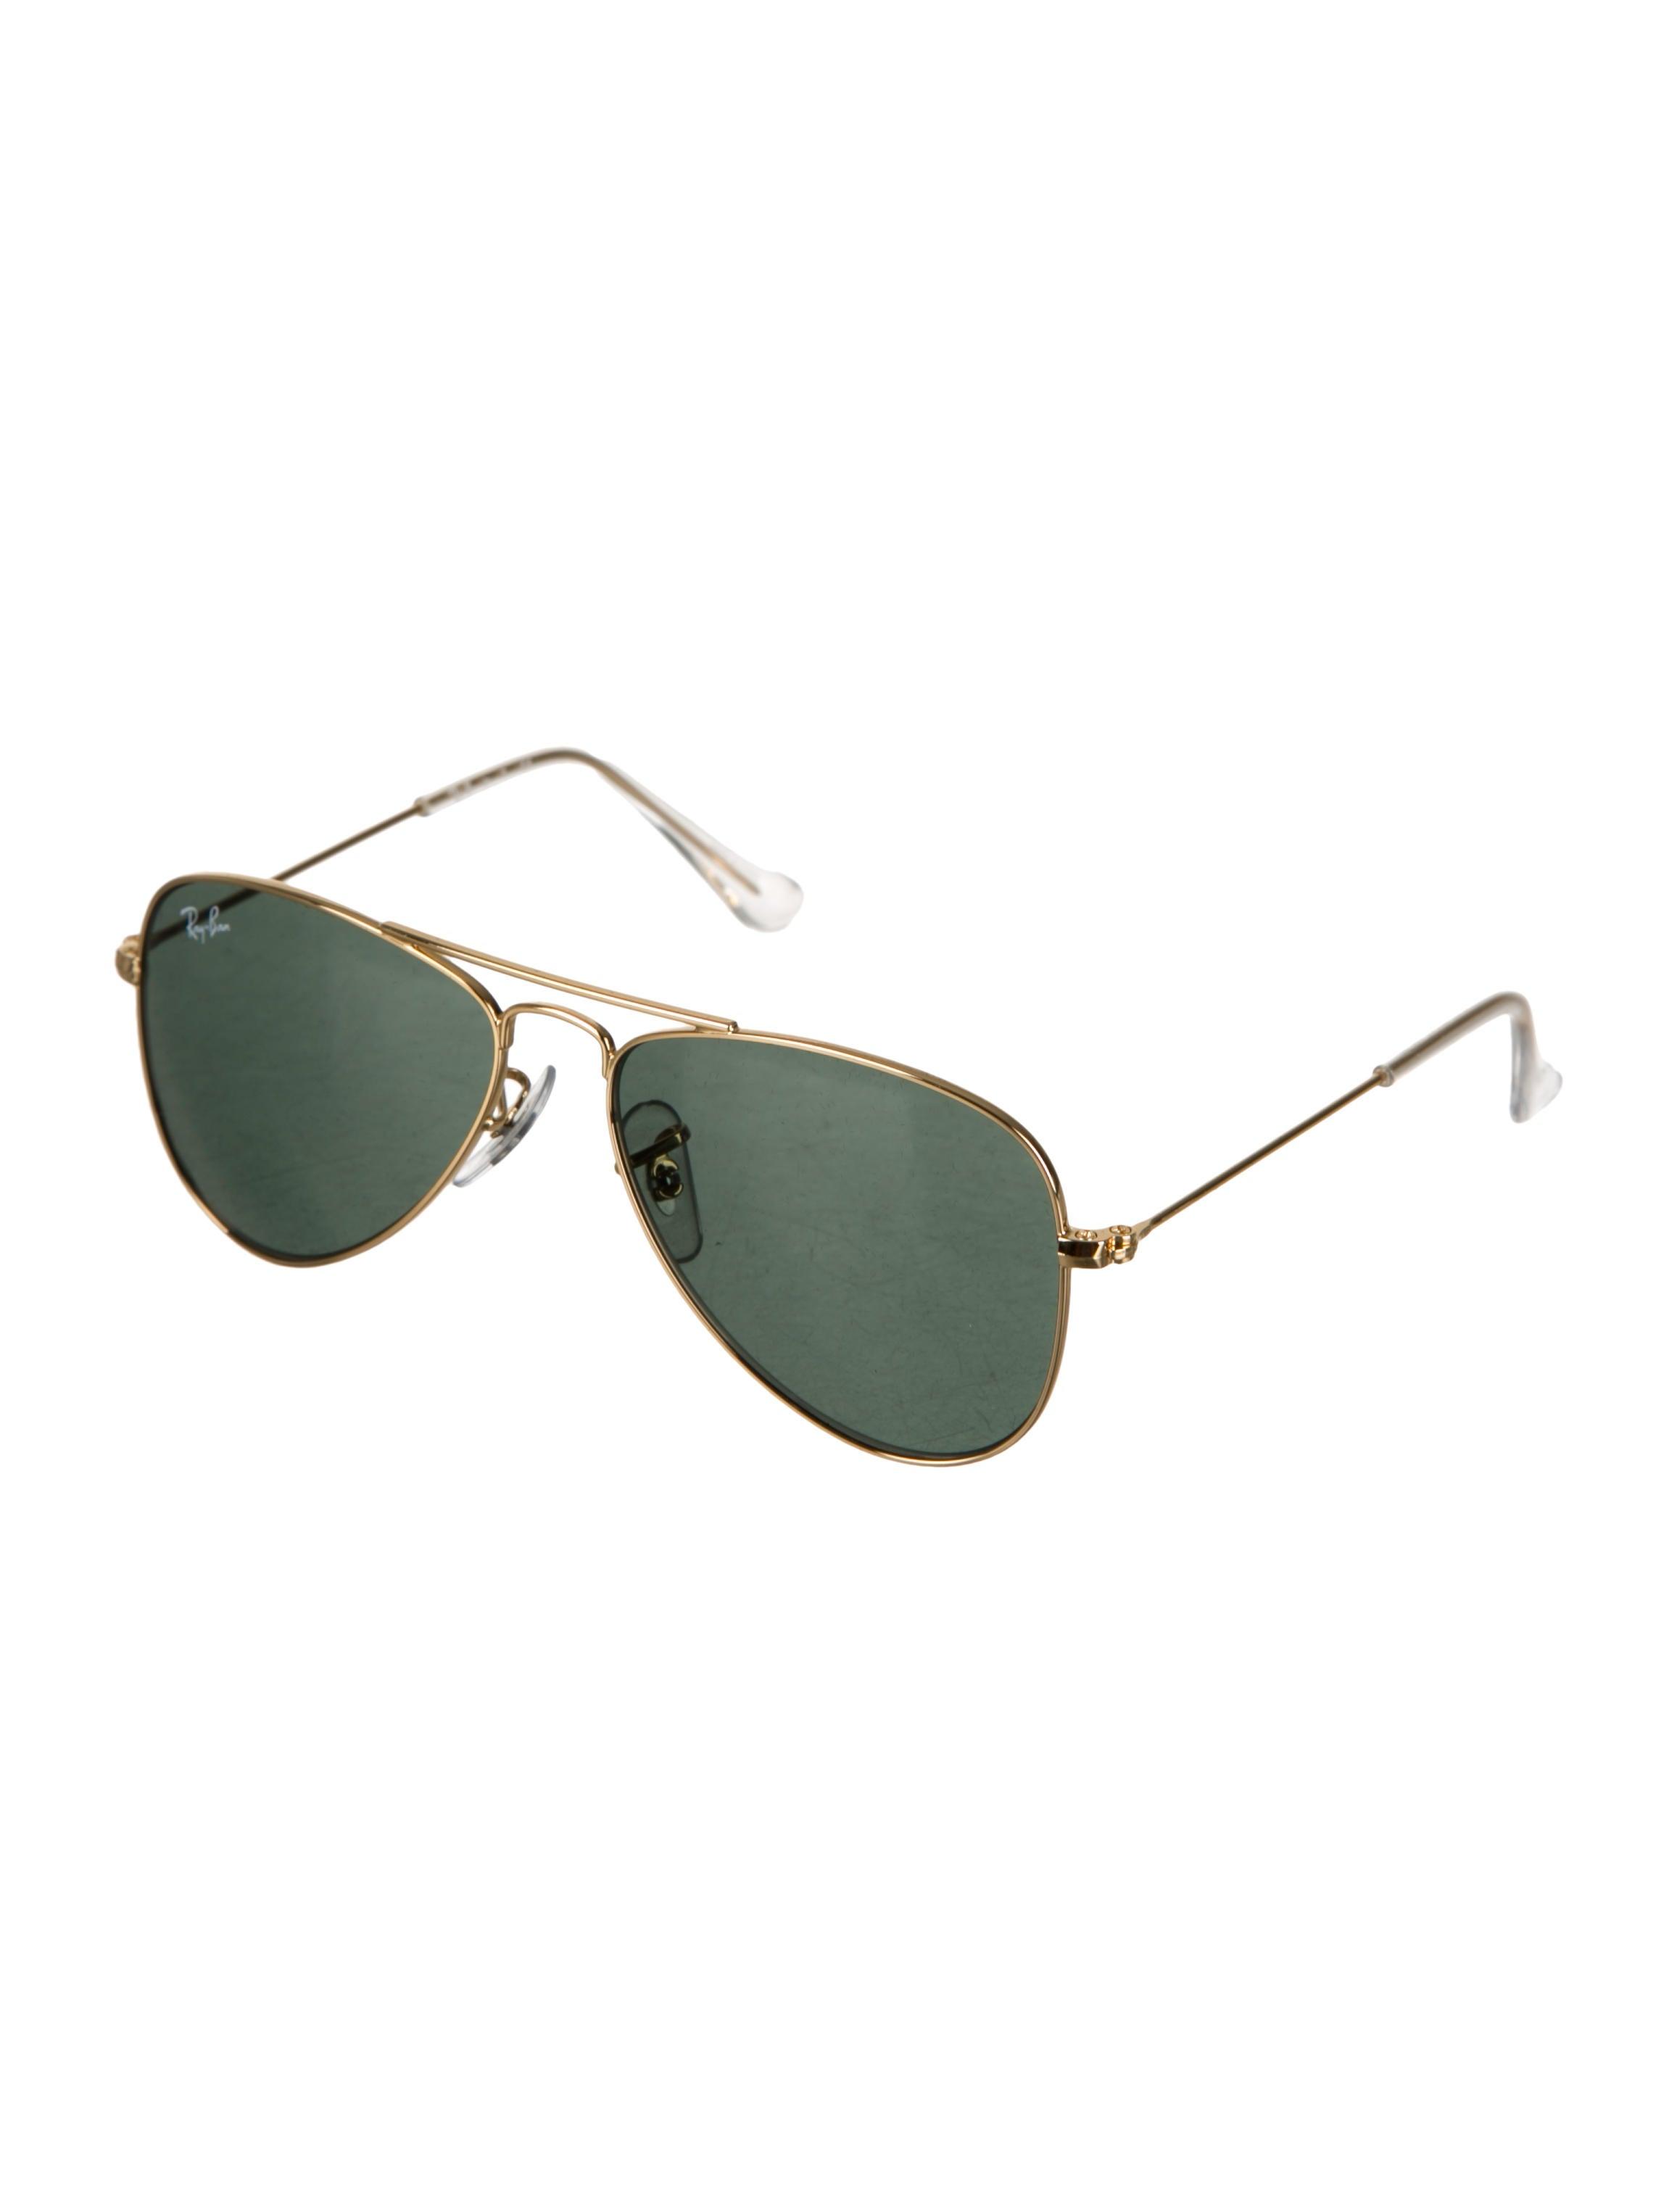 1e38b9a112730 Ray-Ban Girls  Gold-Tone Aviator Sunglasses - Girls - WRX23041